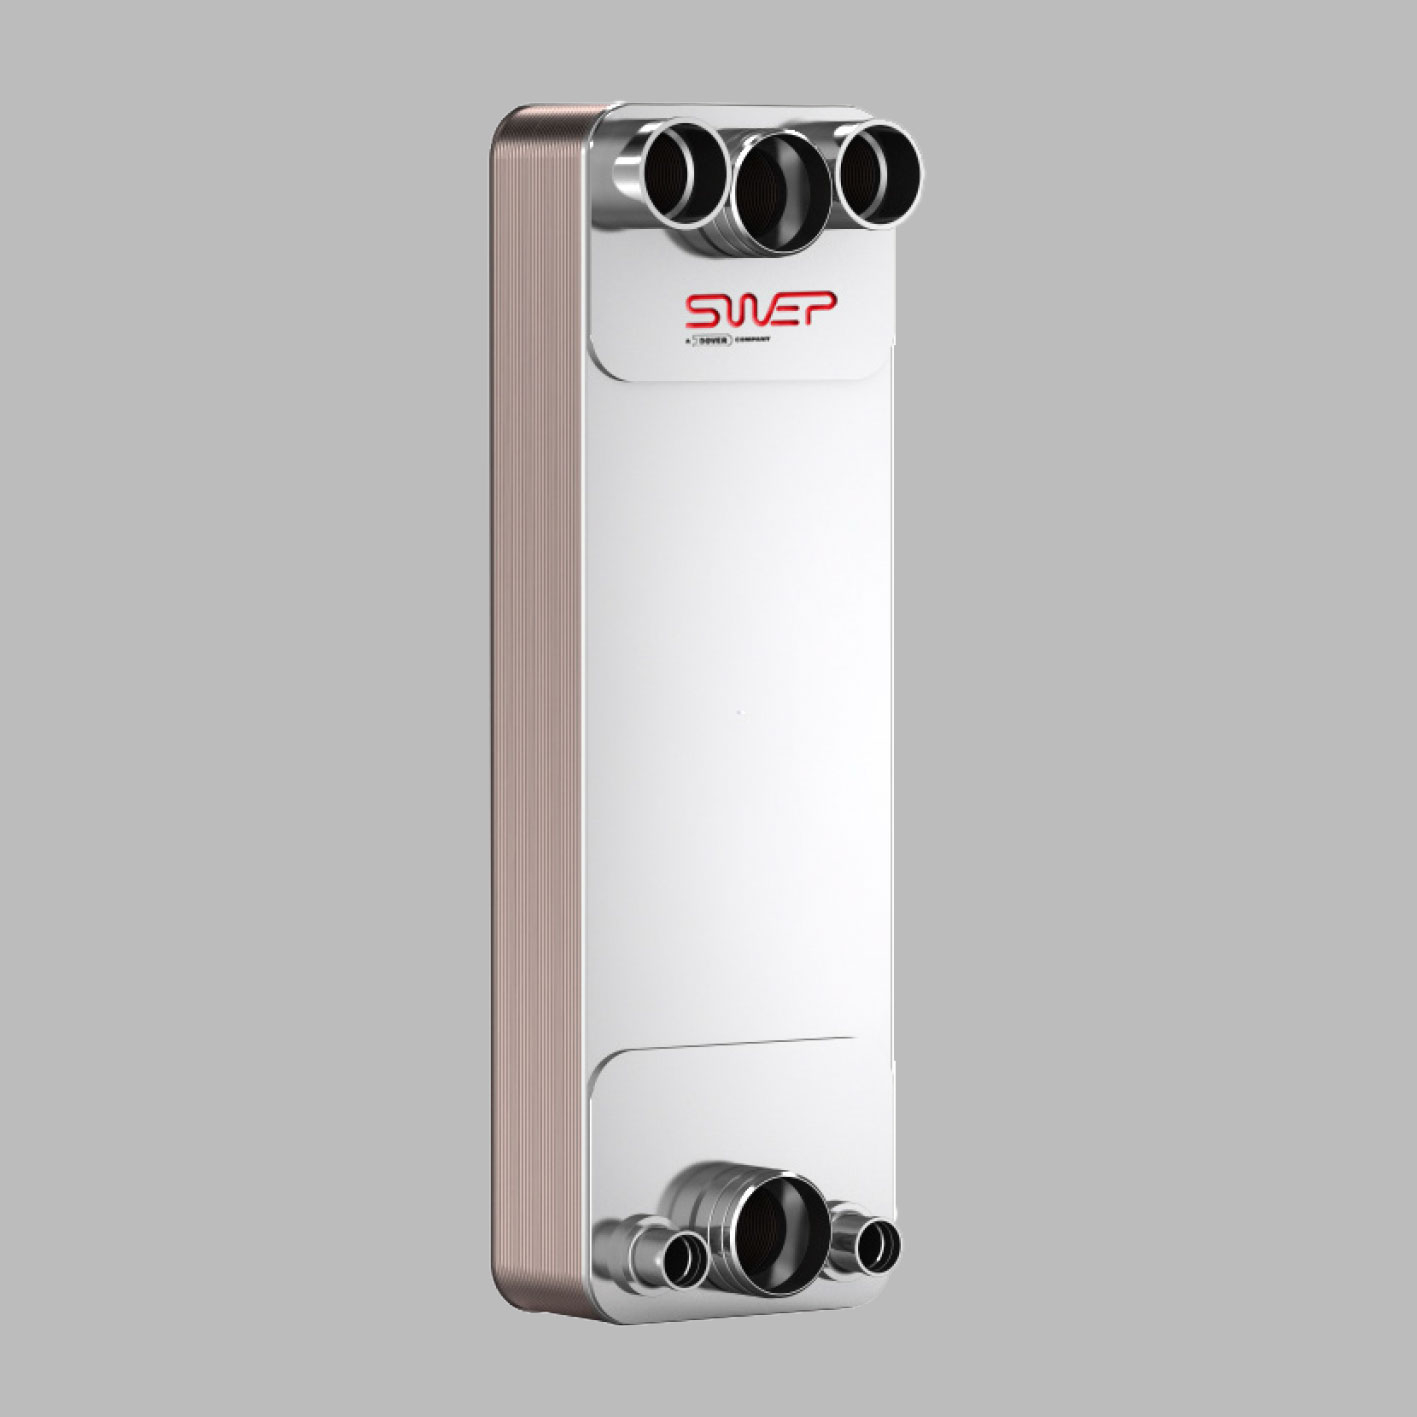 DB500